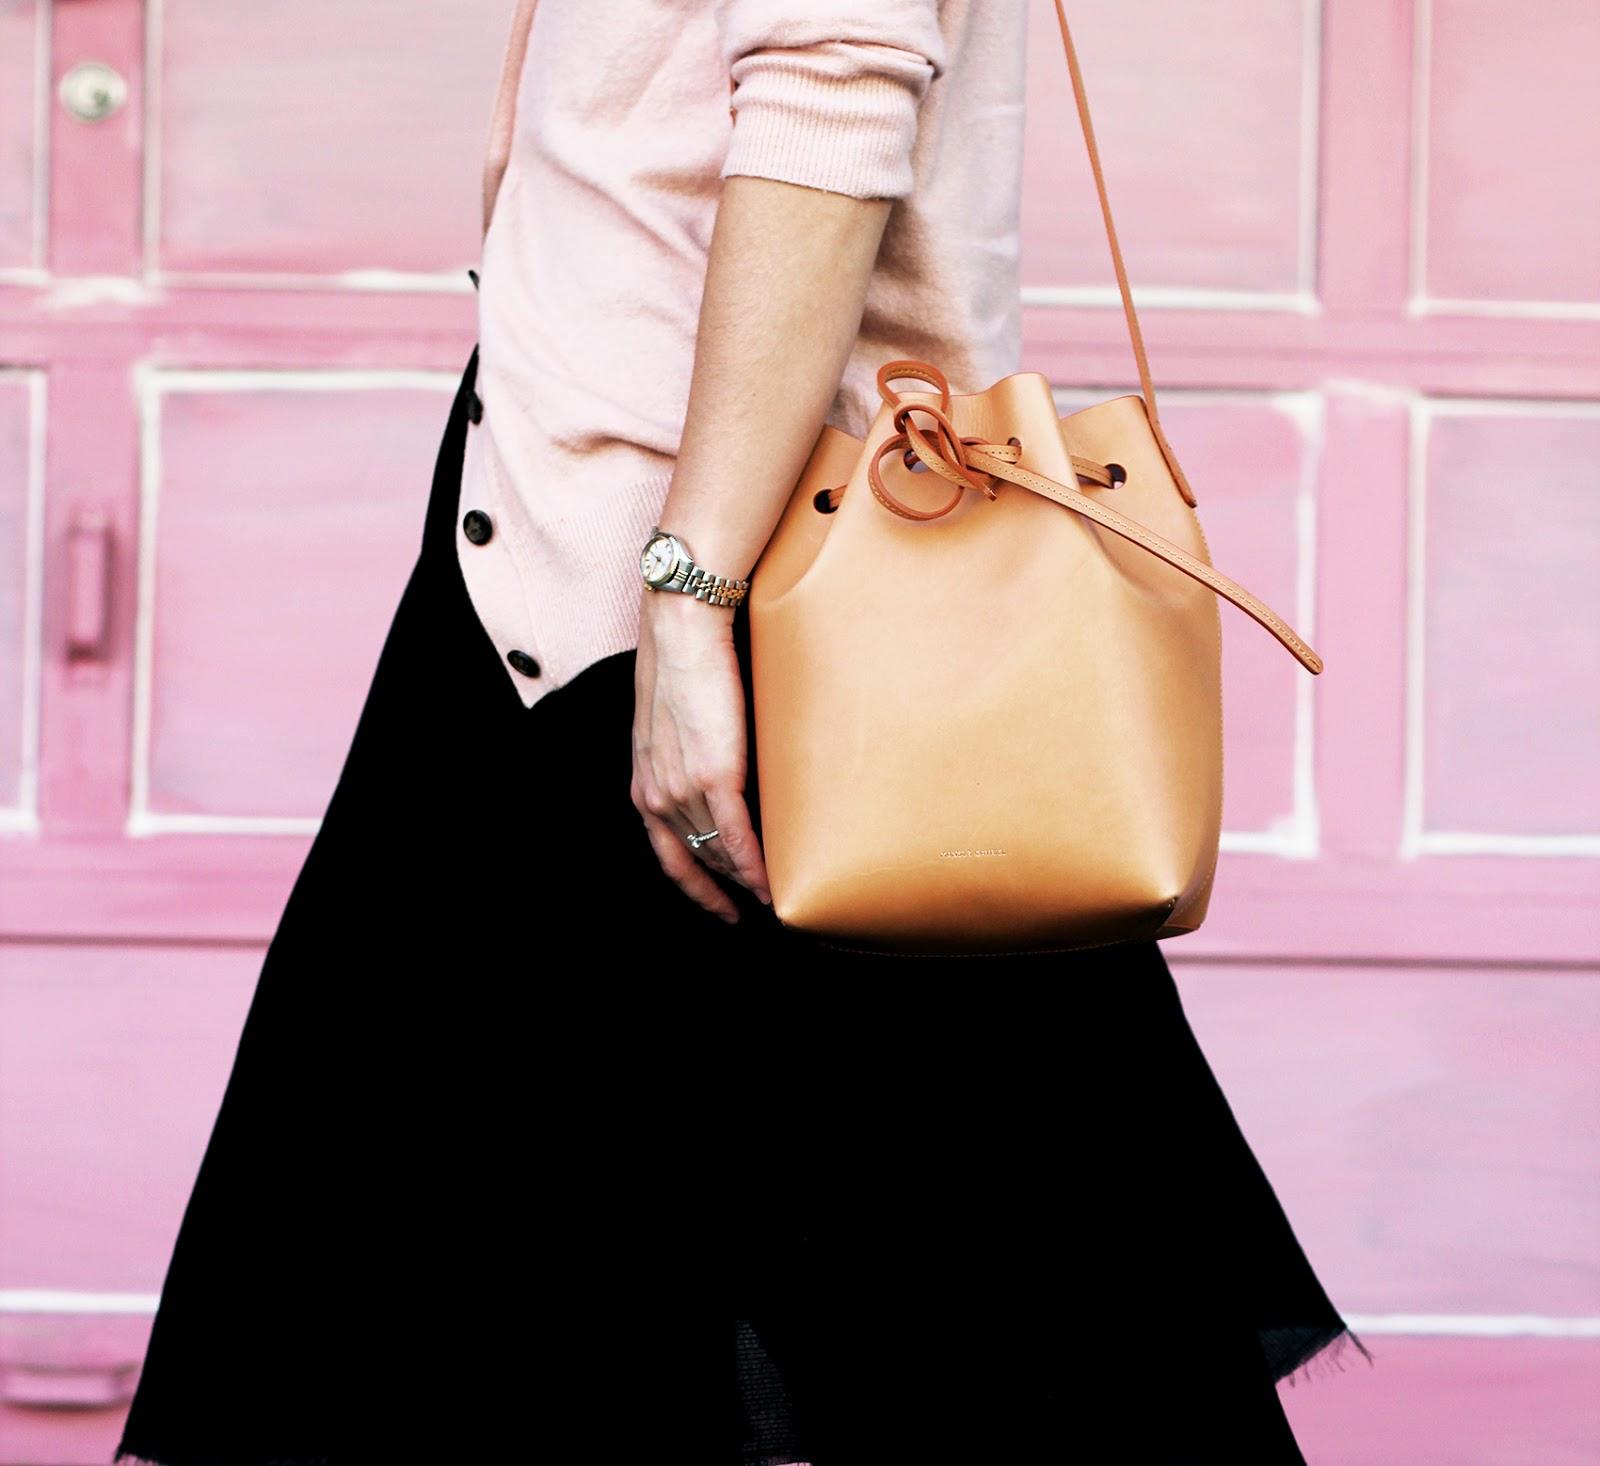 779x850-twelveofour-pink-lady-IMG_6471.jpg